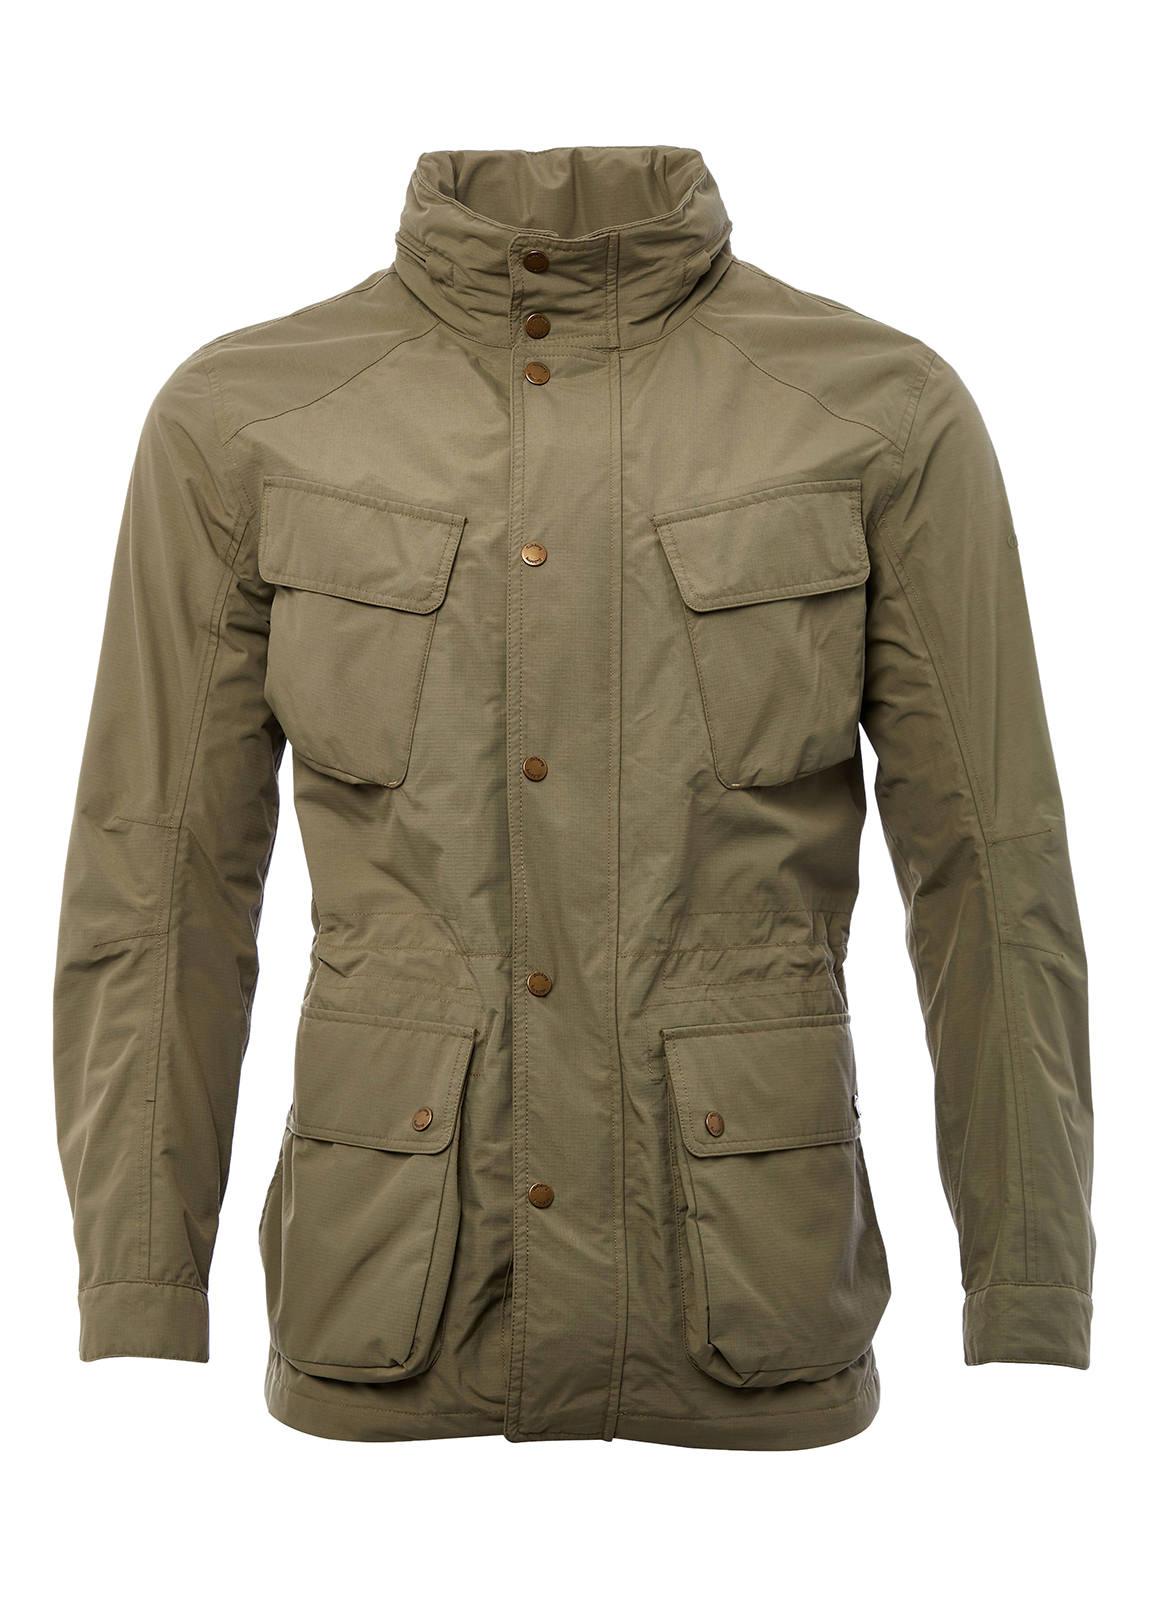 Dubarry_Thornton Waterproof Jacket - Tobacco_Image_2